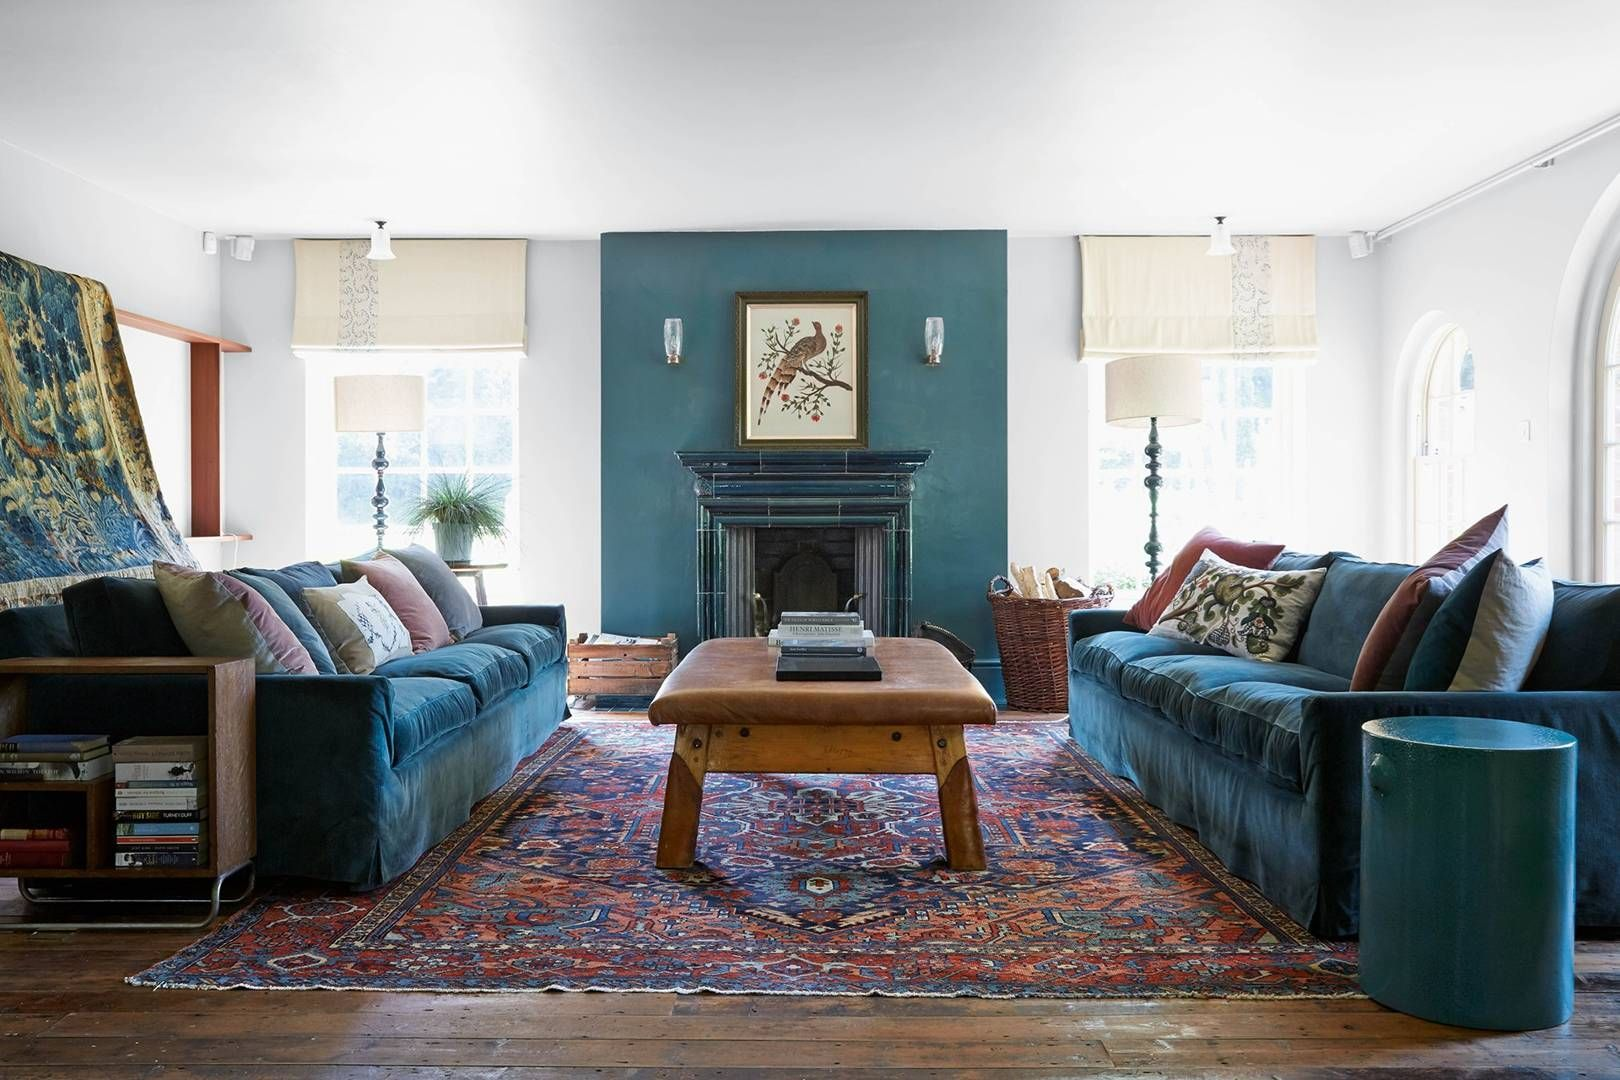 Industrial Living Room Teal Teal Blue Wall Paint Ideas Industrialliving Roomteal Blue Living Room Living Room Designs Room Design #teal #and #blue #living #room